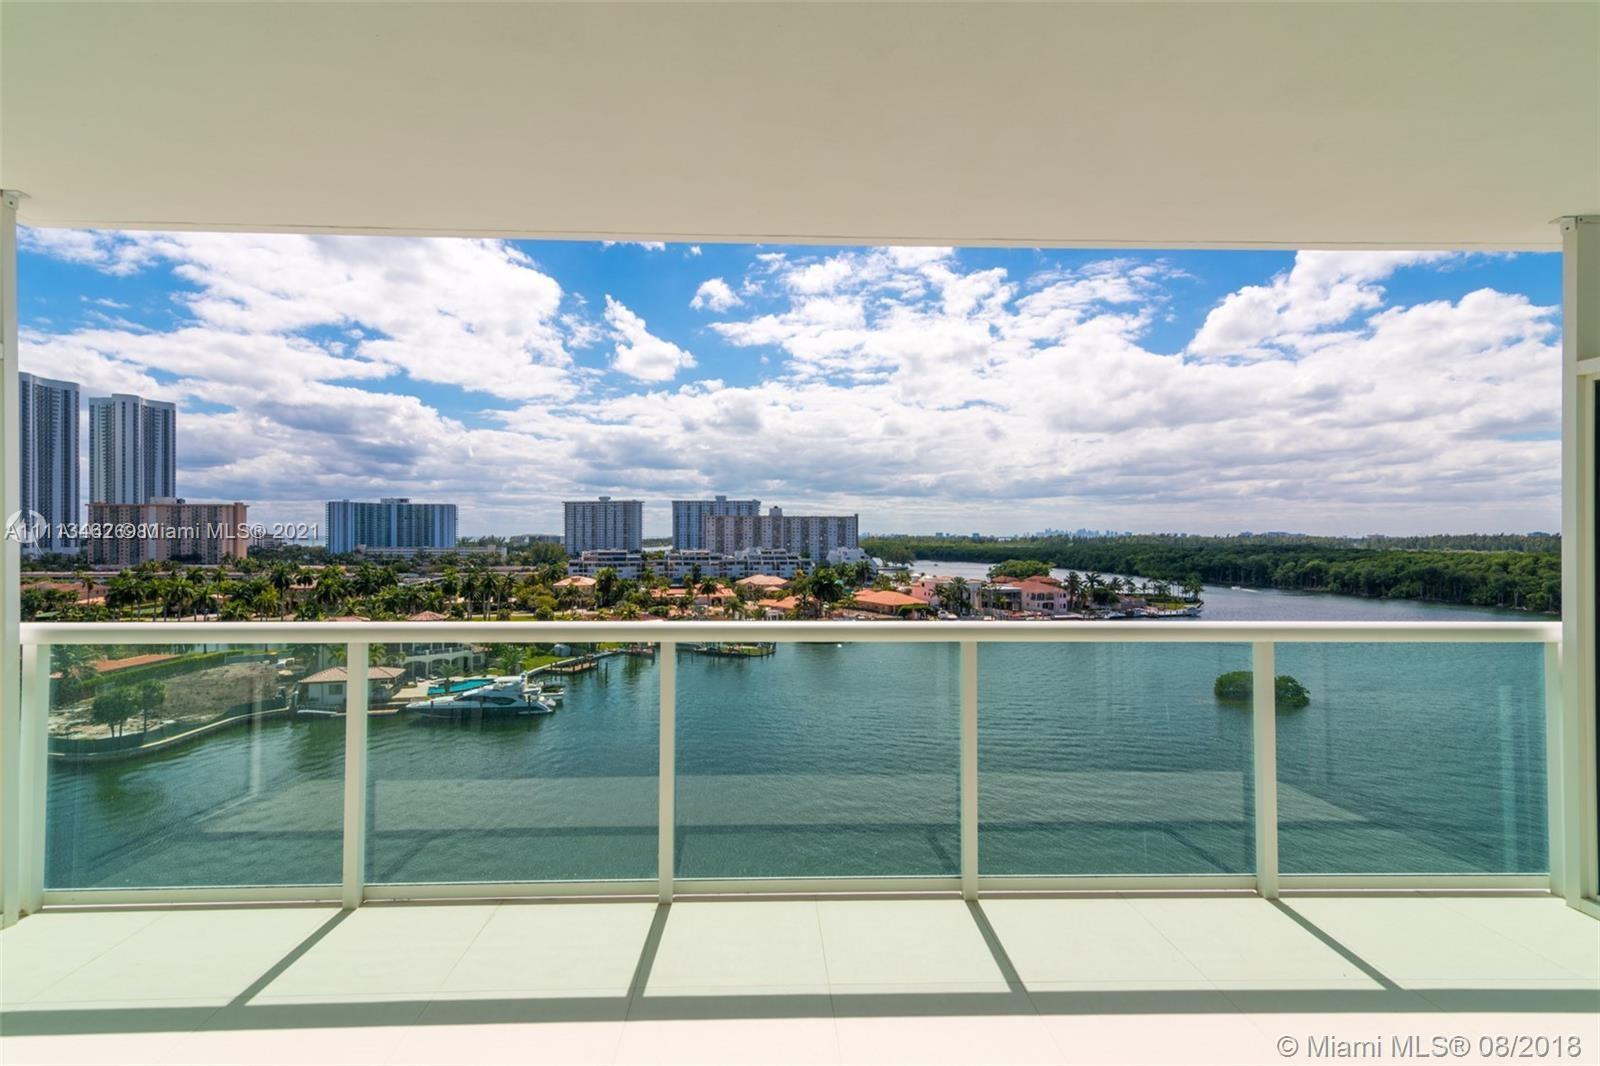 400 Sunny Isles #1019 - 400 Sunny Isles Blvd #1019, Sunny Isles Beach, FL 33160